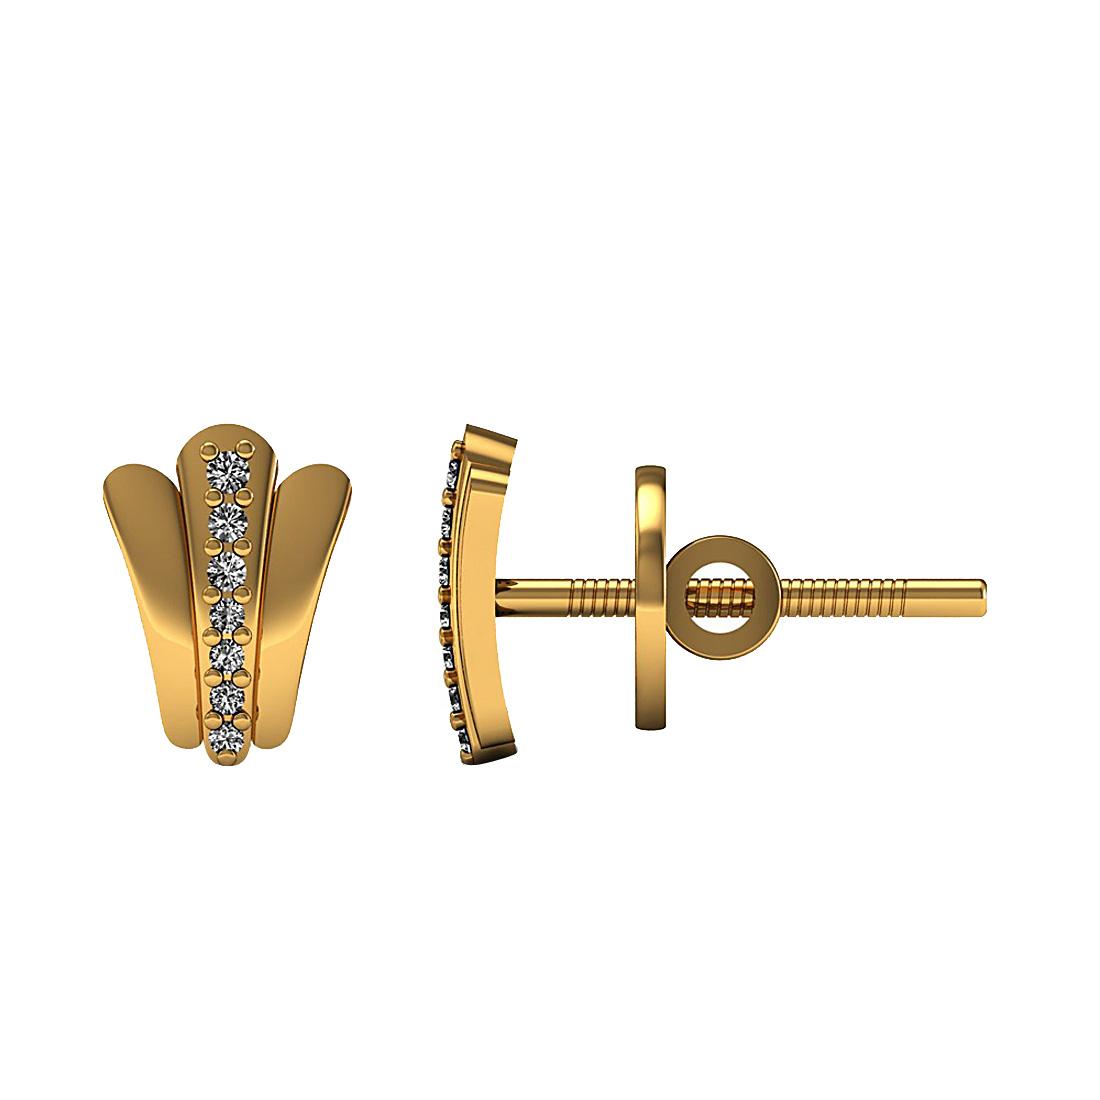 Beautiful genuine diamond stud earrings made in 18k solid yellow gold.